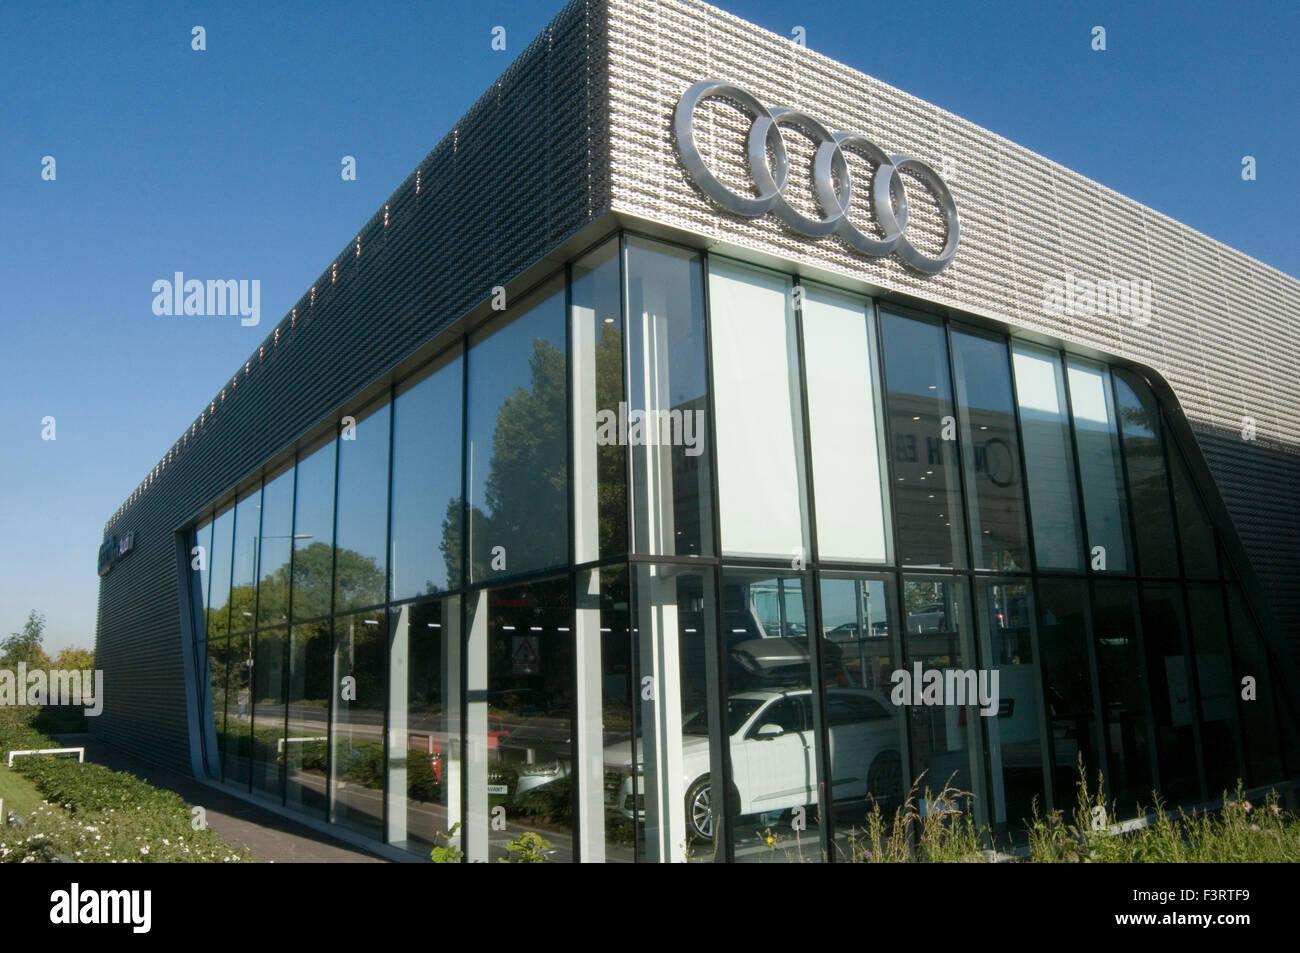 Audi Dealer Dealership Showroom Car Cars New Volkswagen Prestige Stock Photo 88419949 Alamy